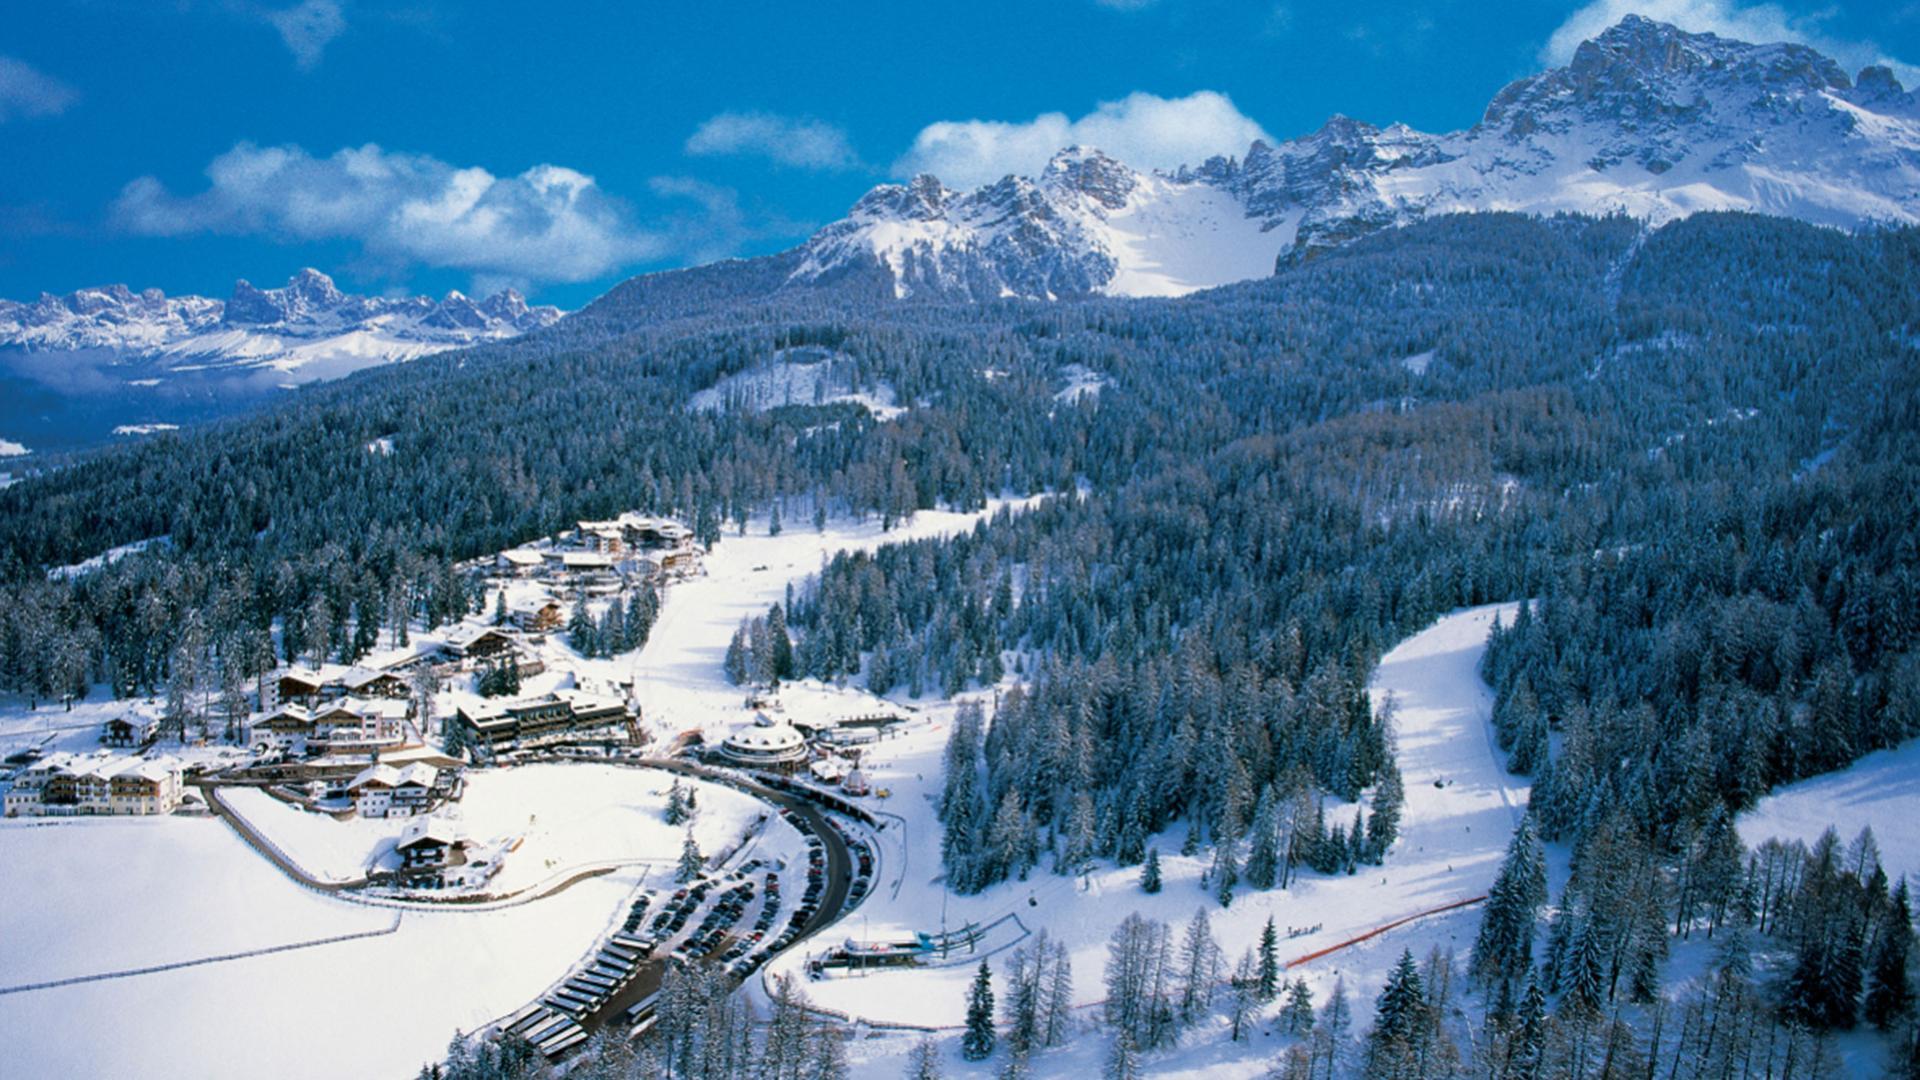 hotel-mondschein-eggental-obereggen-skifahren-1.jpg